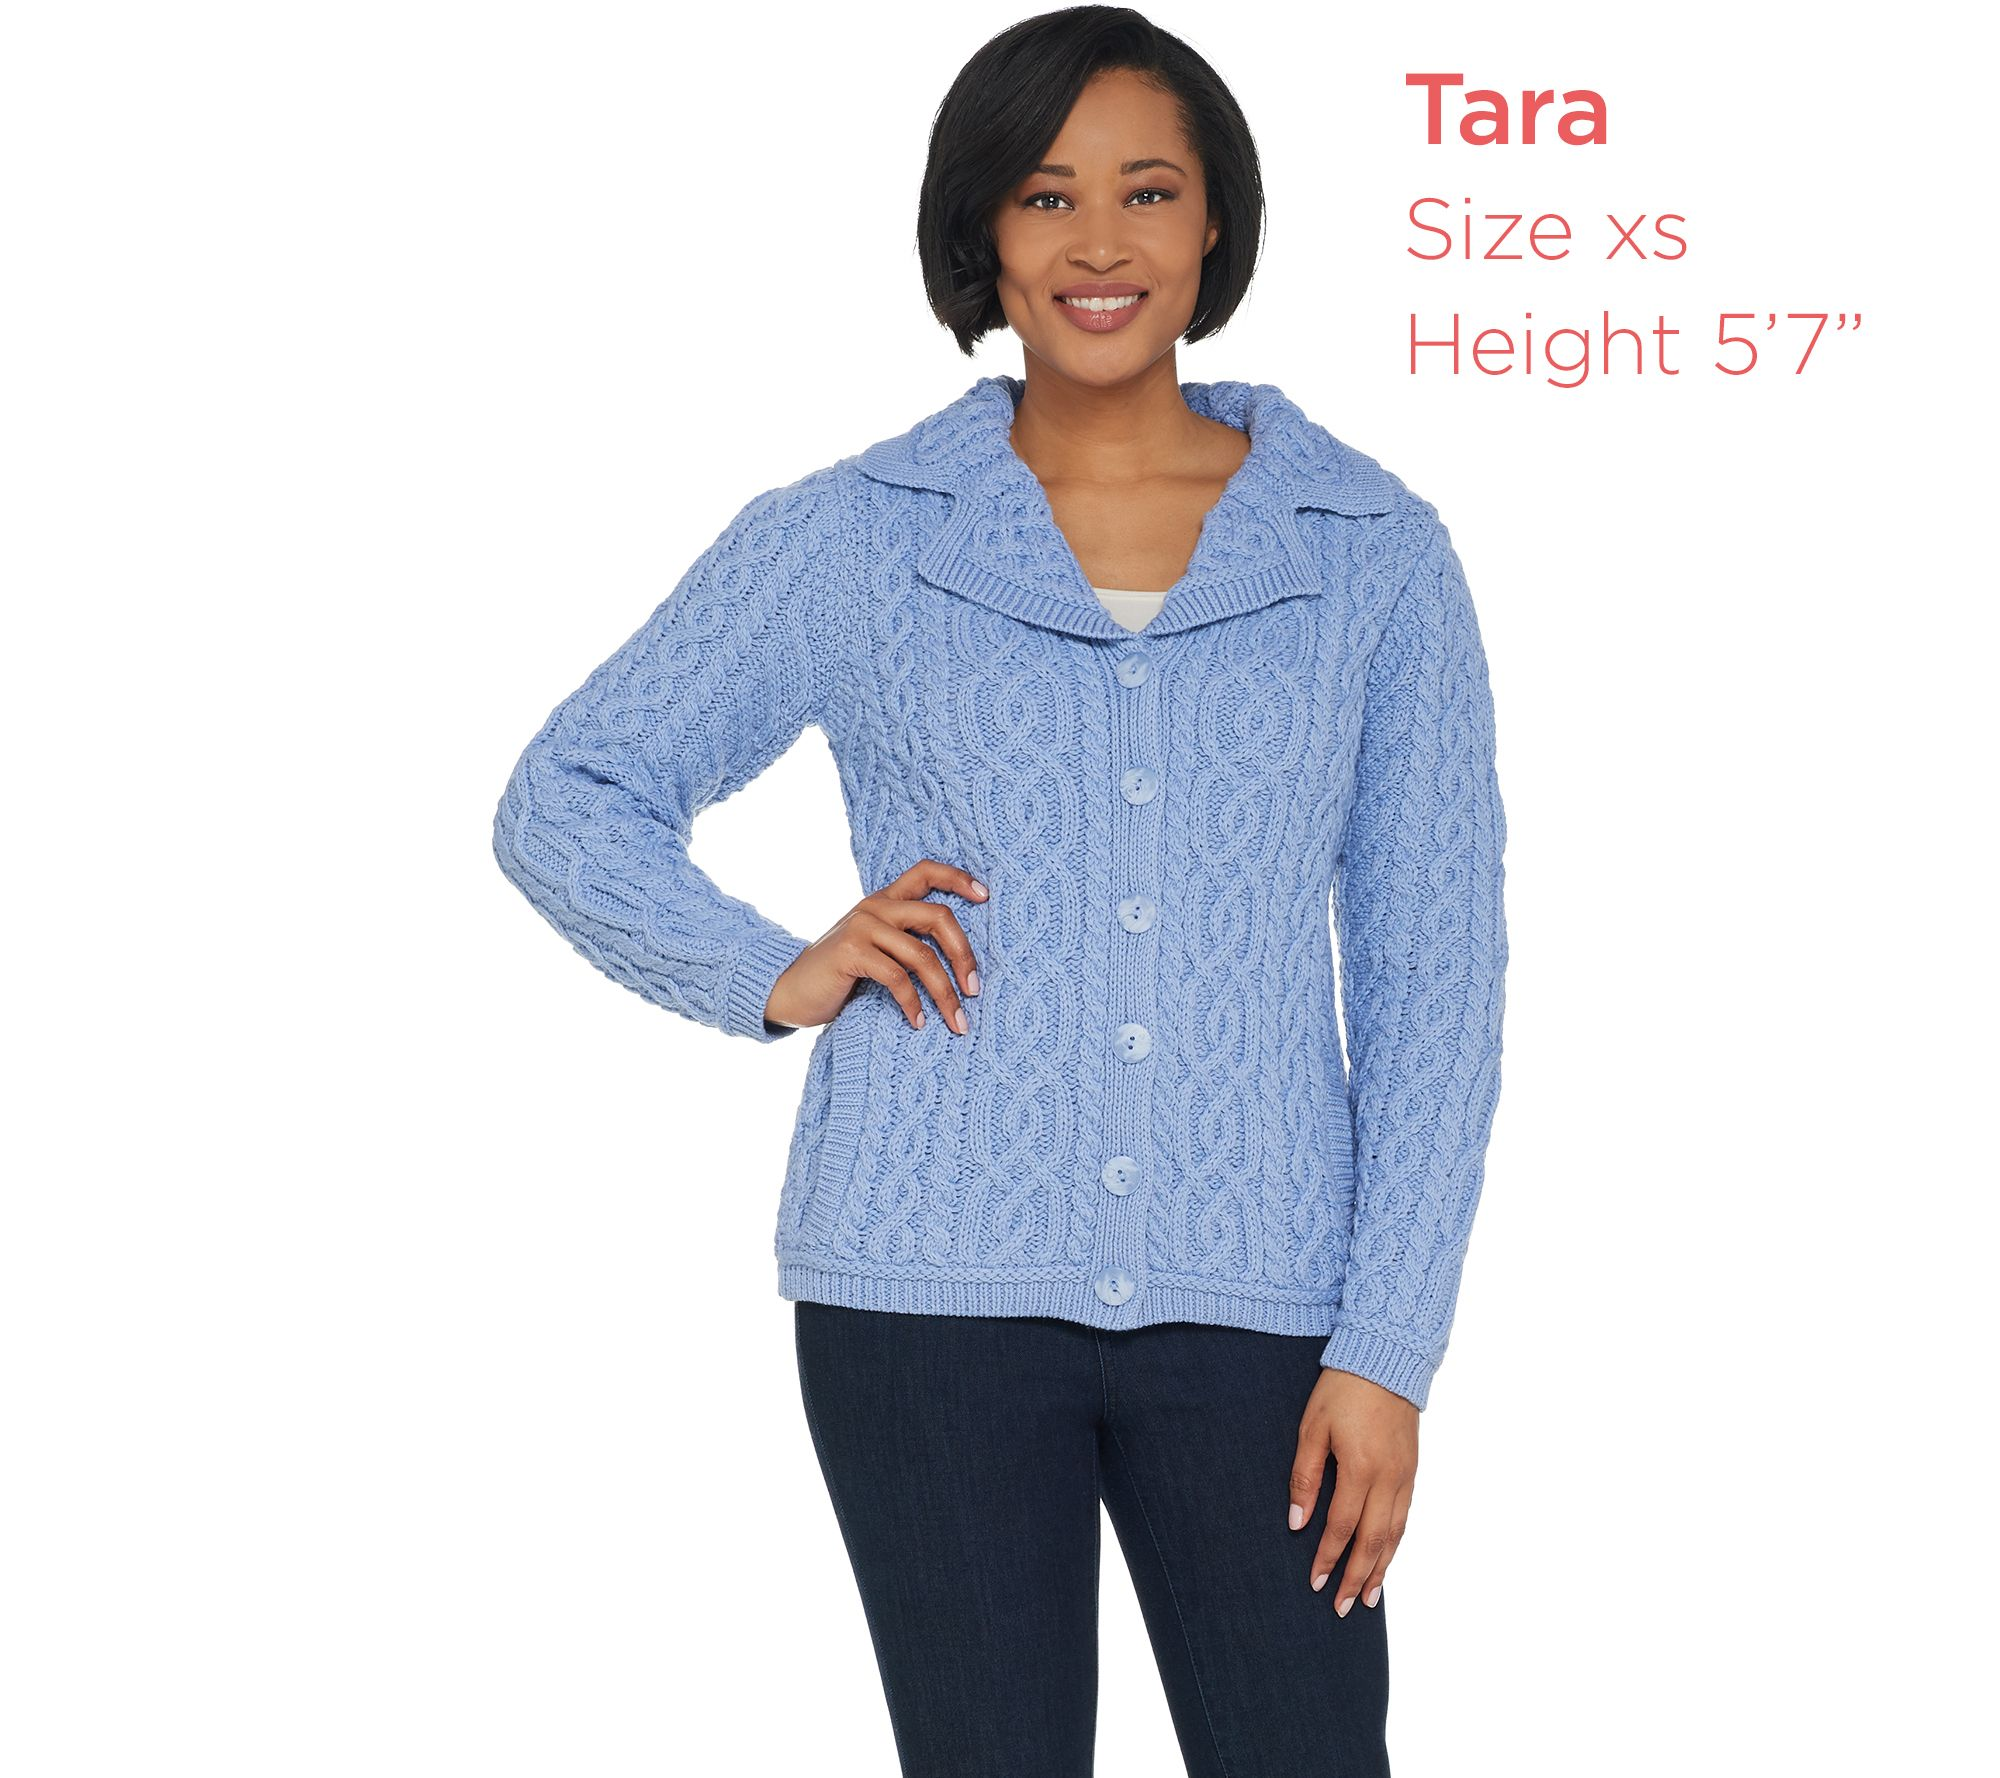 47e8876be99928 Aran Craft Merino Wool Button Front Sweater Cardigan - Page 1 — QVC.com